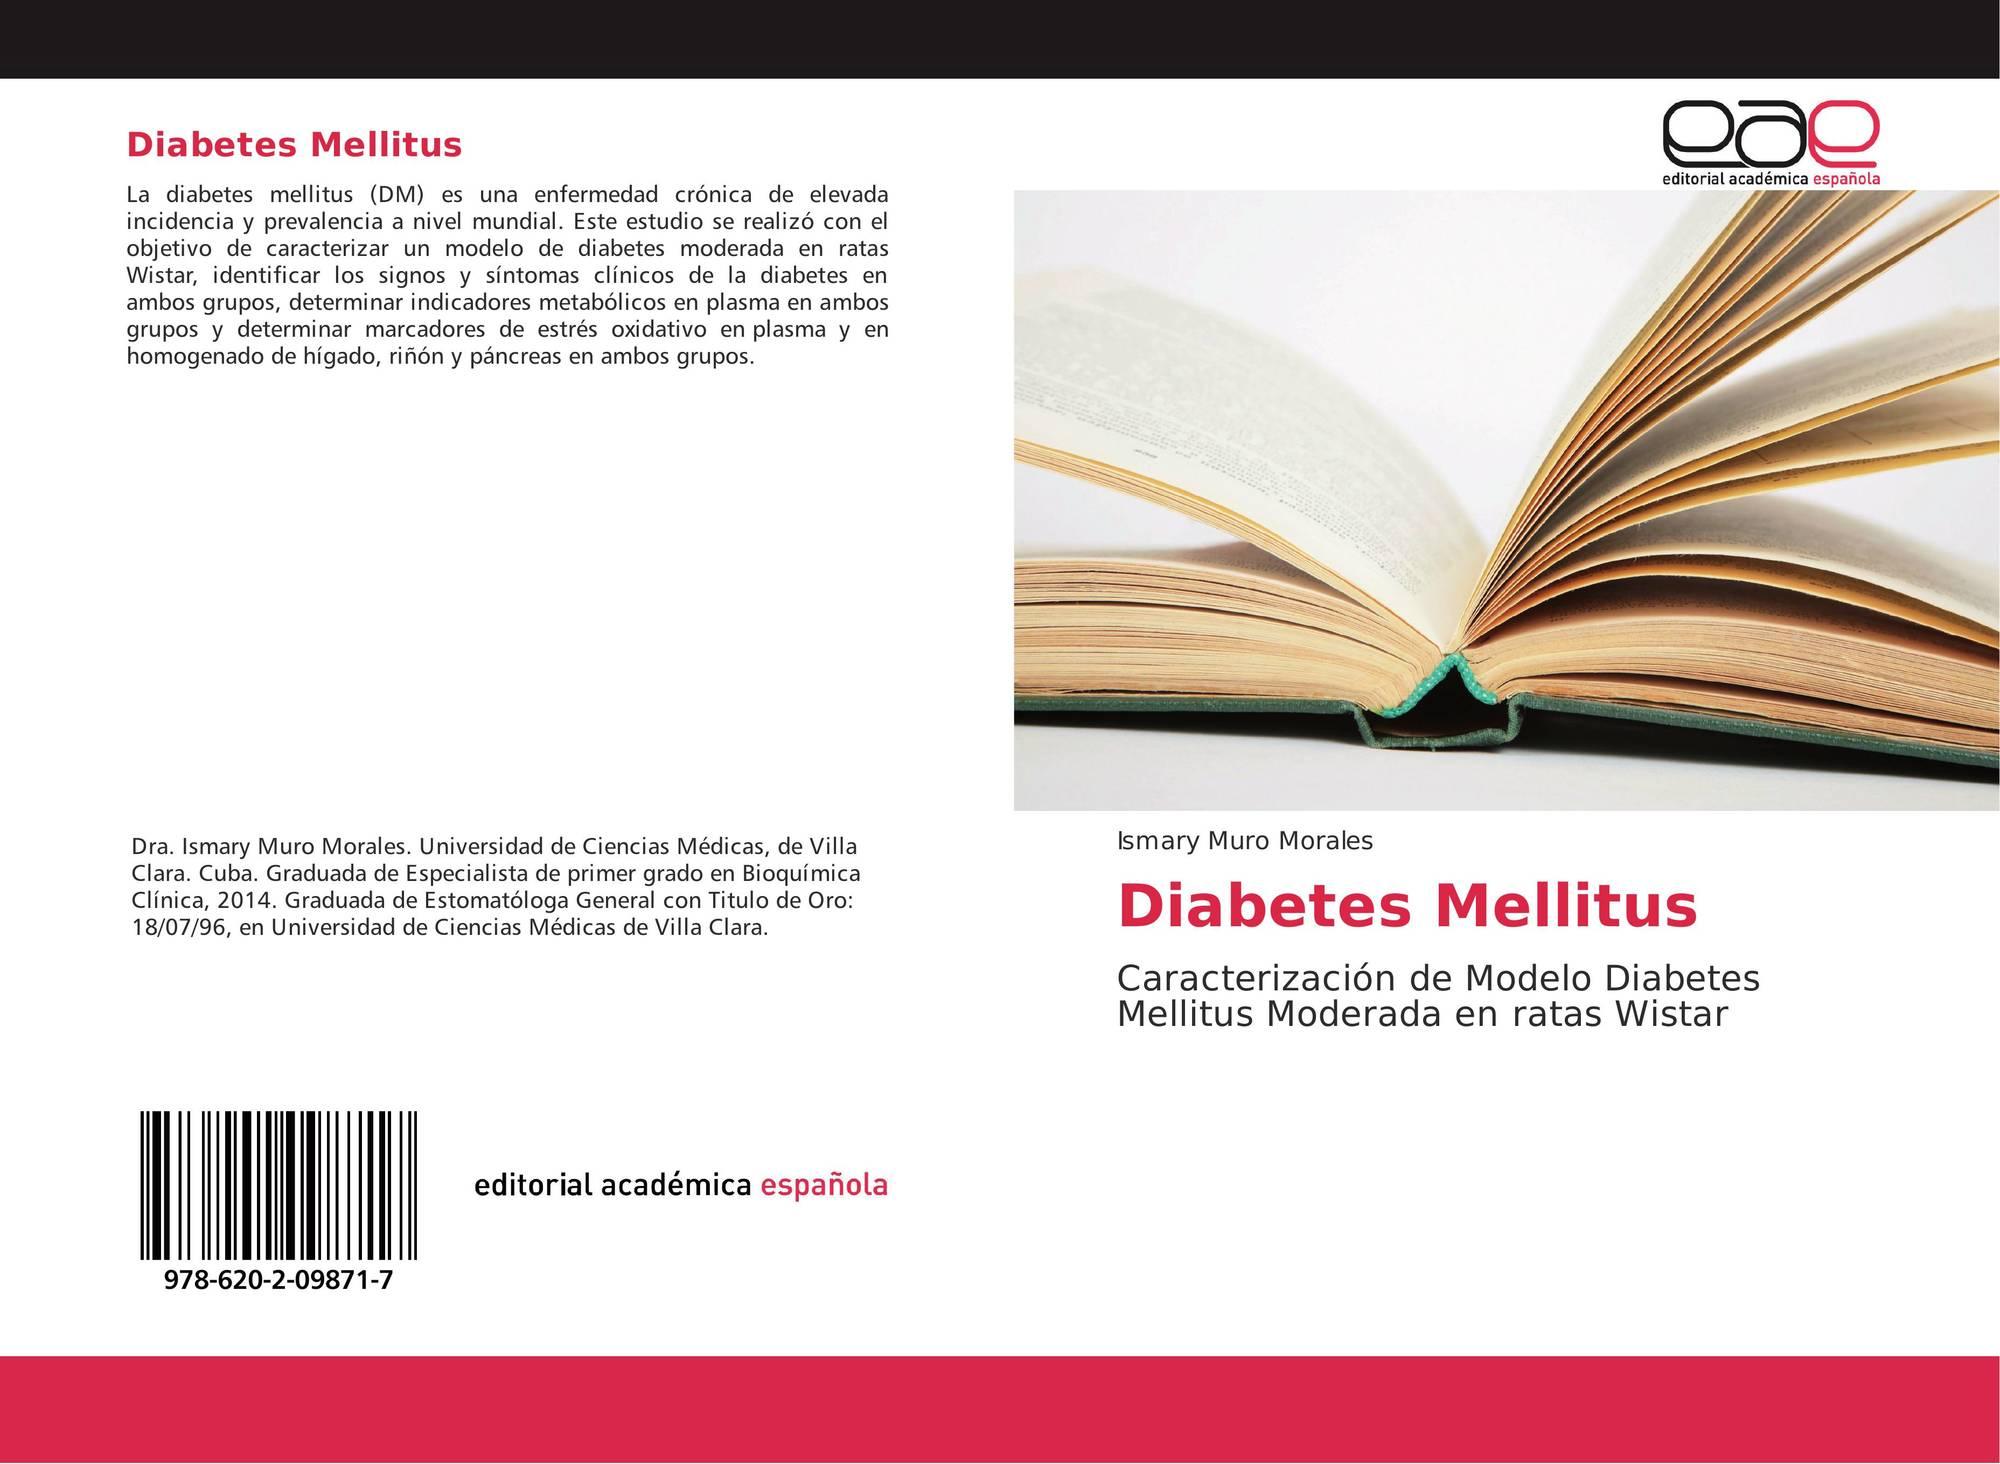 Kottwitz signos de diabetes